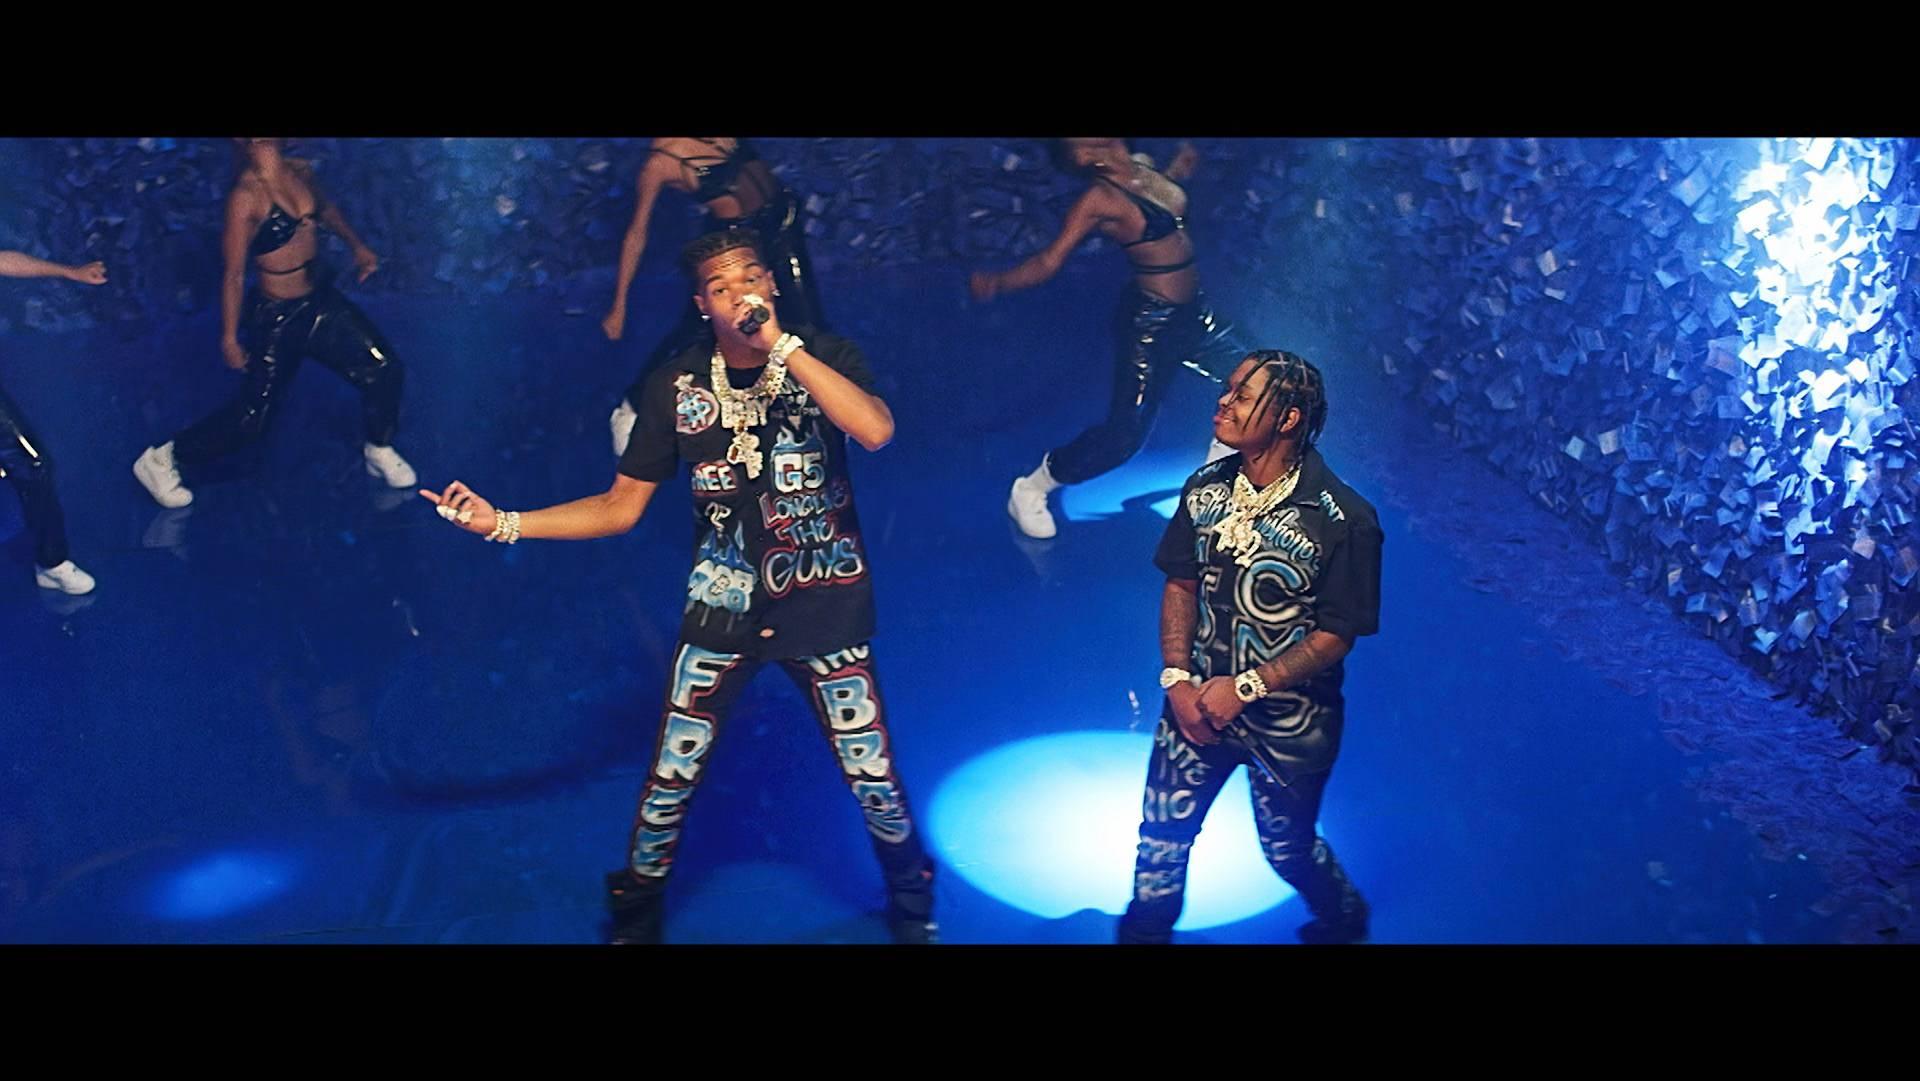 Hip Hop Awards 2020 | Show Highlights Gallery Lil Baby/42 Dugg | 1920x1080